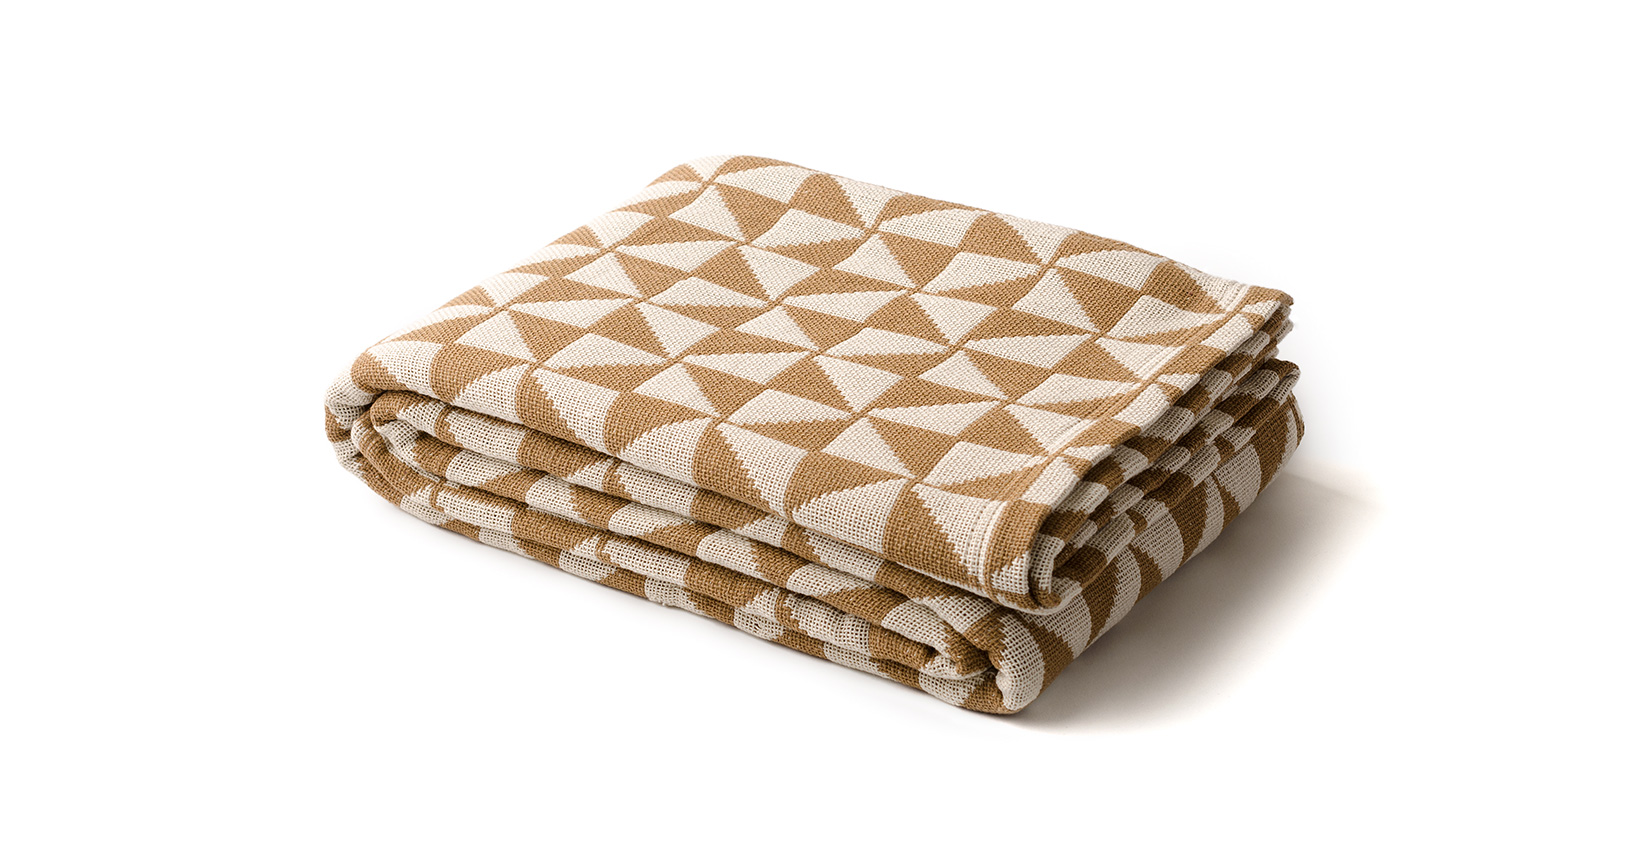 Bedspreads, colchas - Brasil